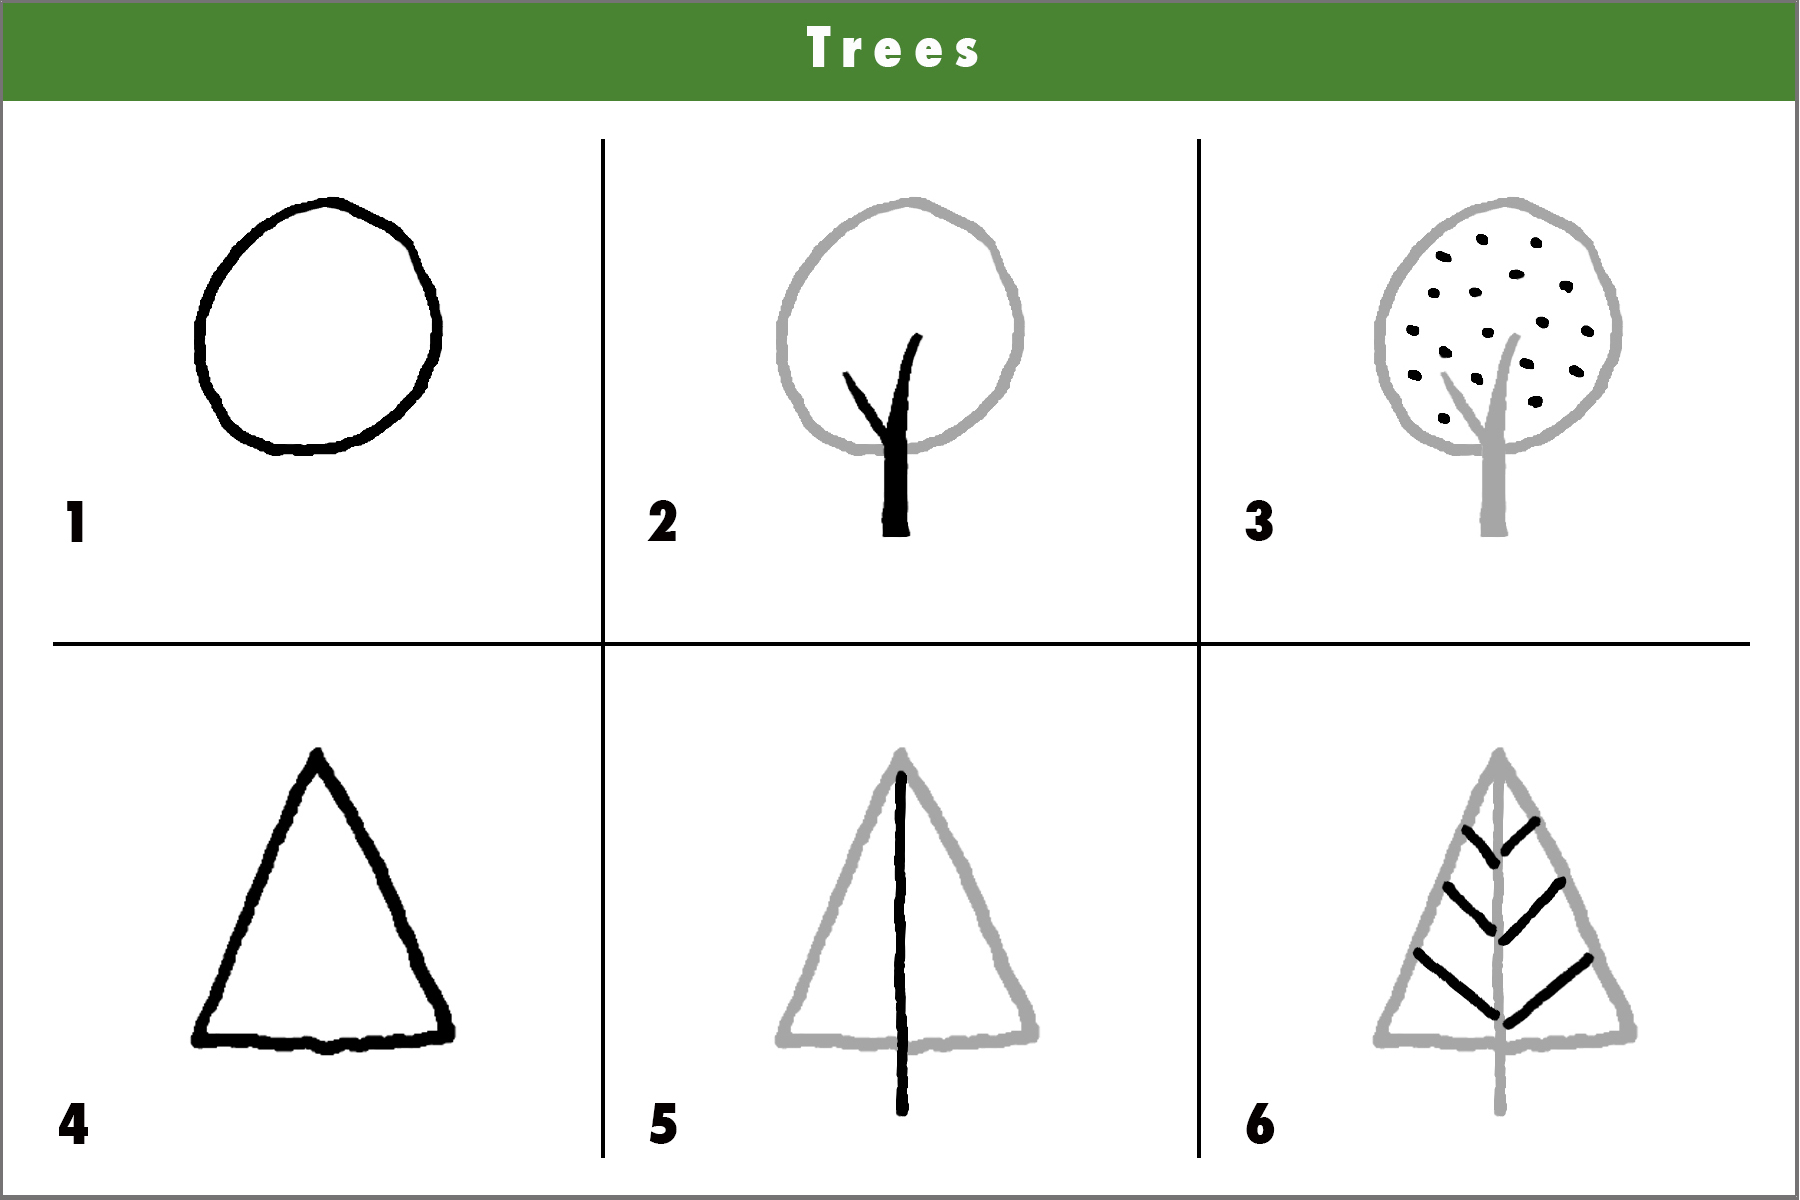 Step By Step Tree Drawing At Getdrawings